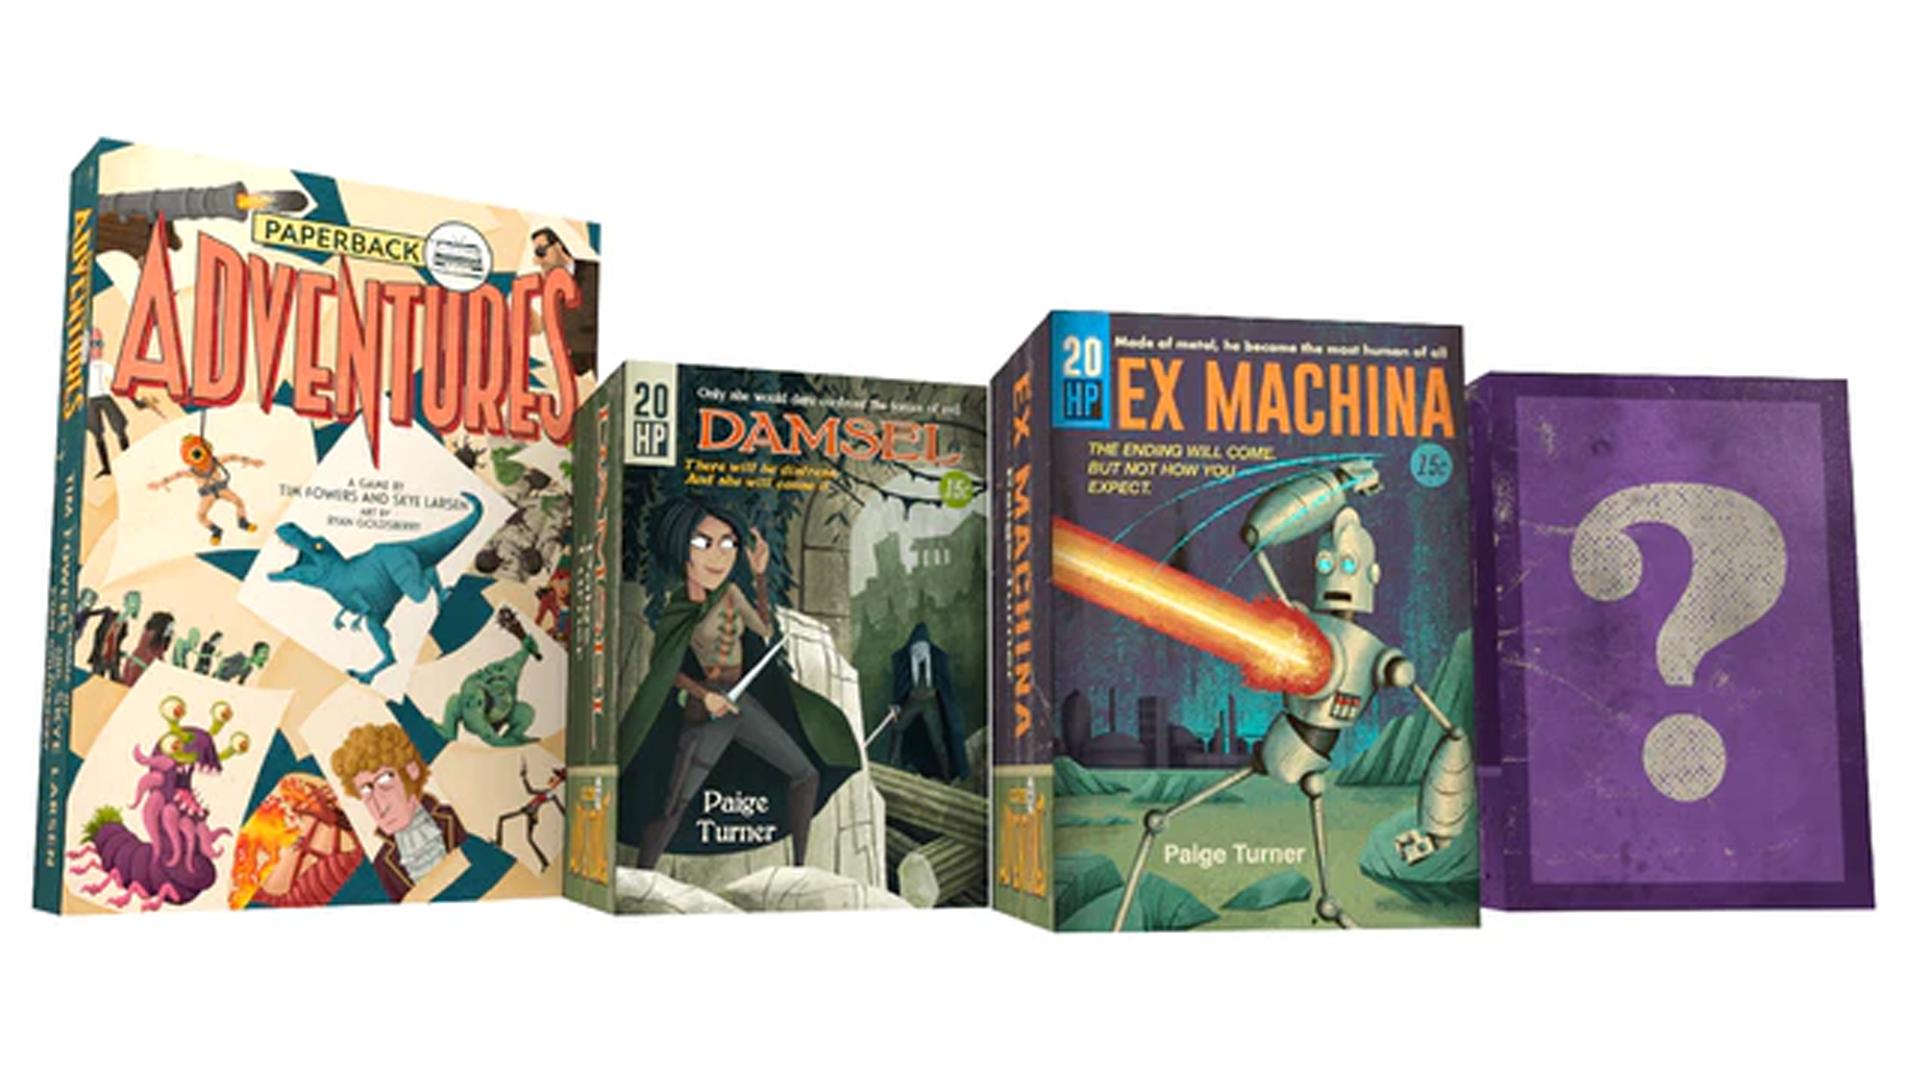 Paperback Adventures boxes